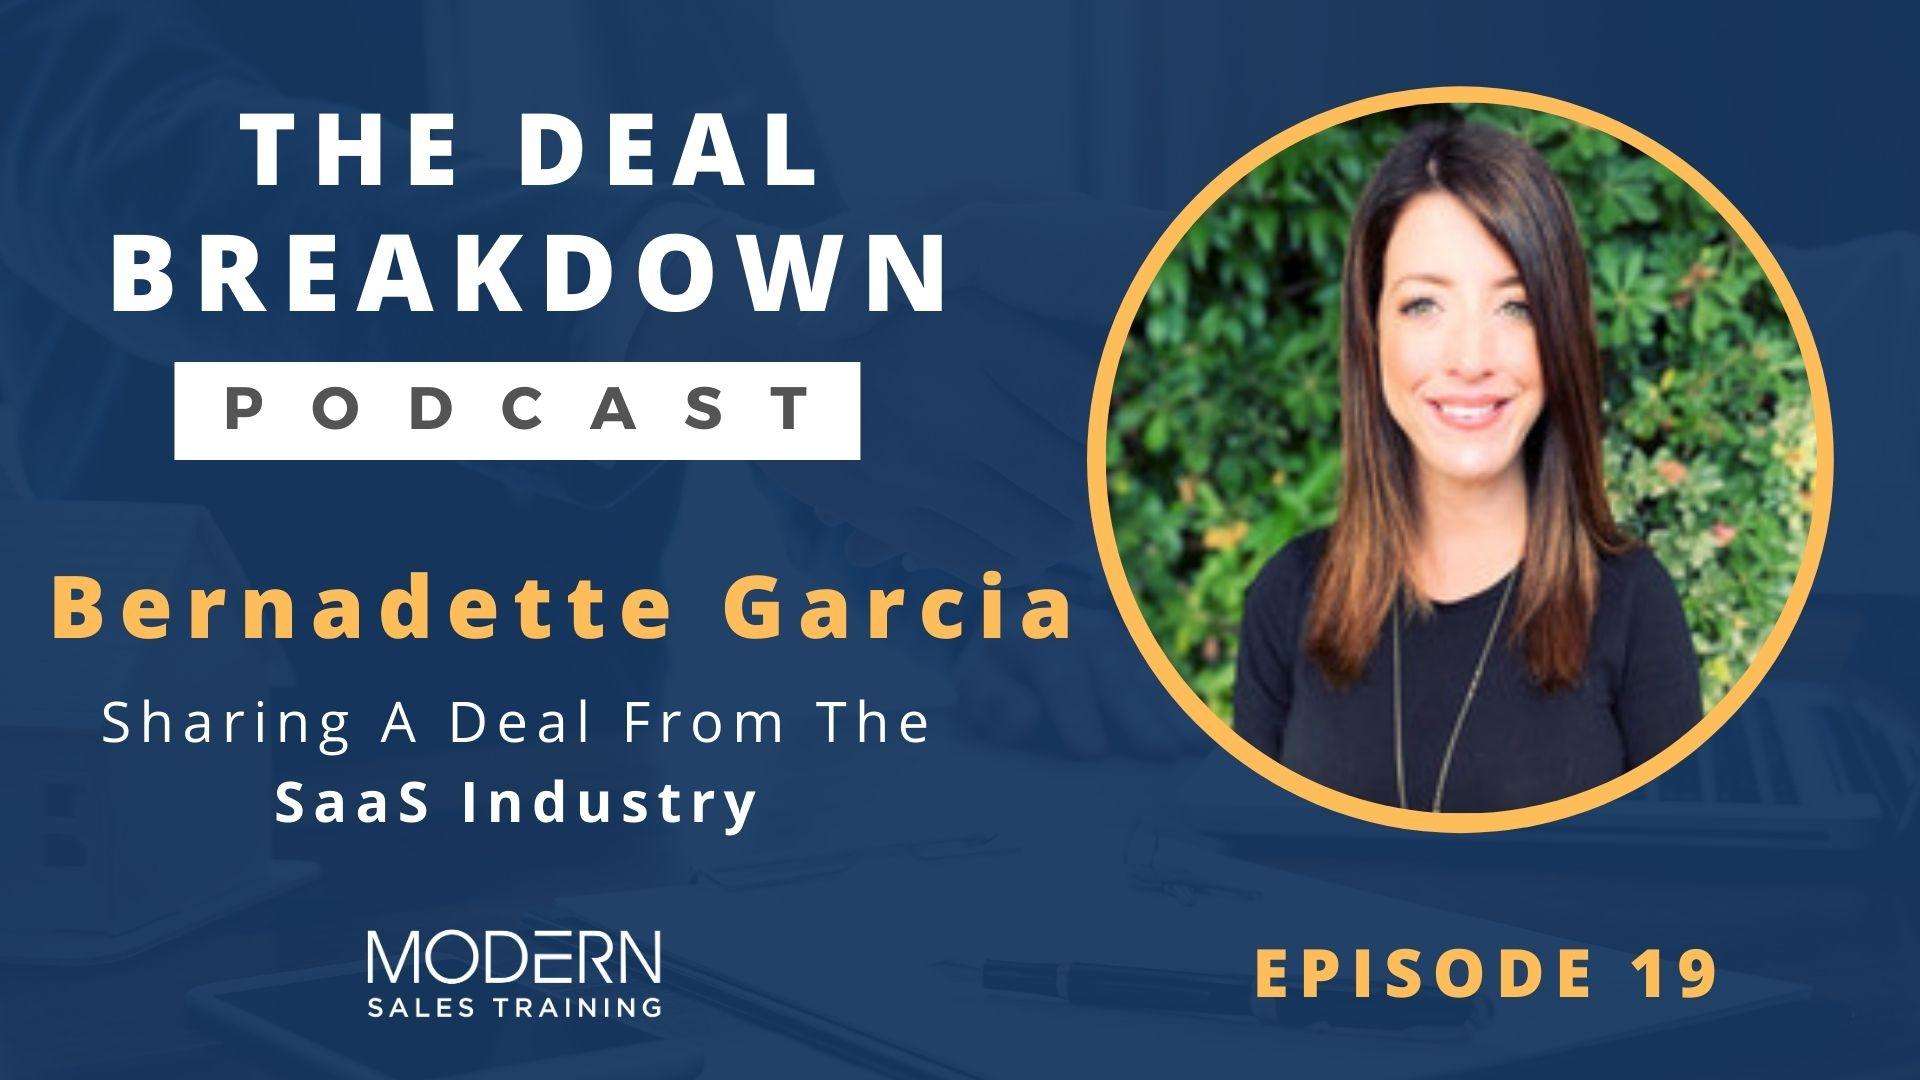 The-Deal-Breakdown-Podcast-Modern-Sales-Training-Bernadette-Garcia